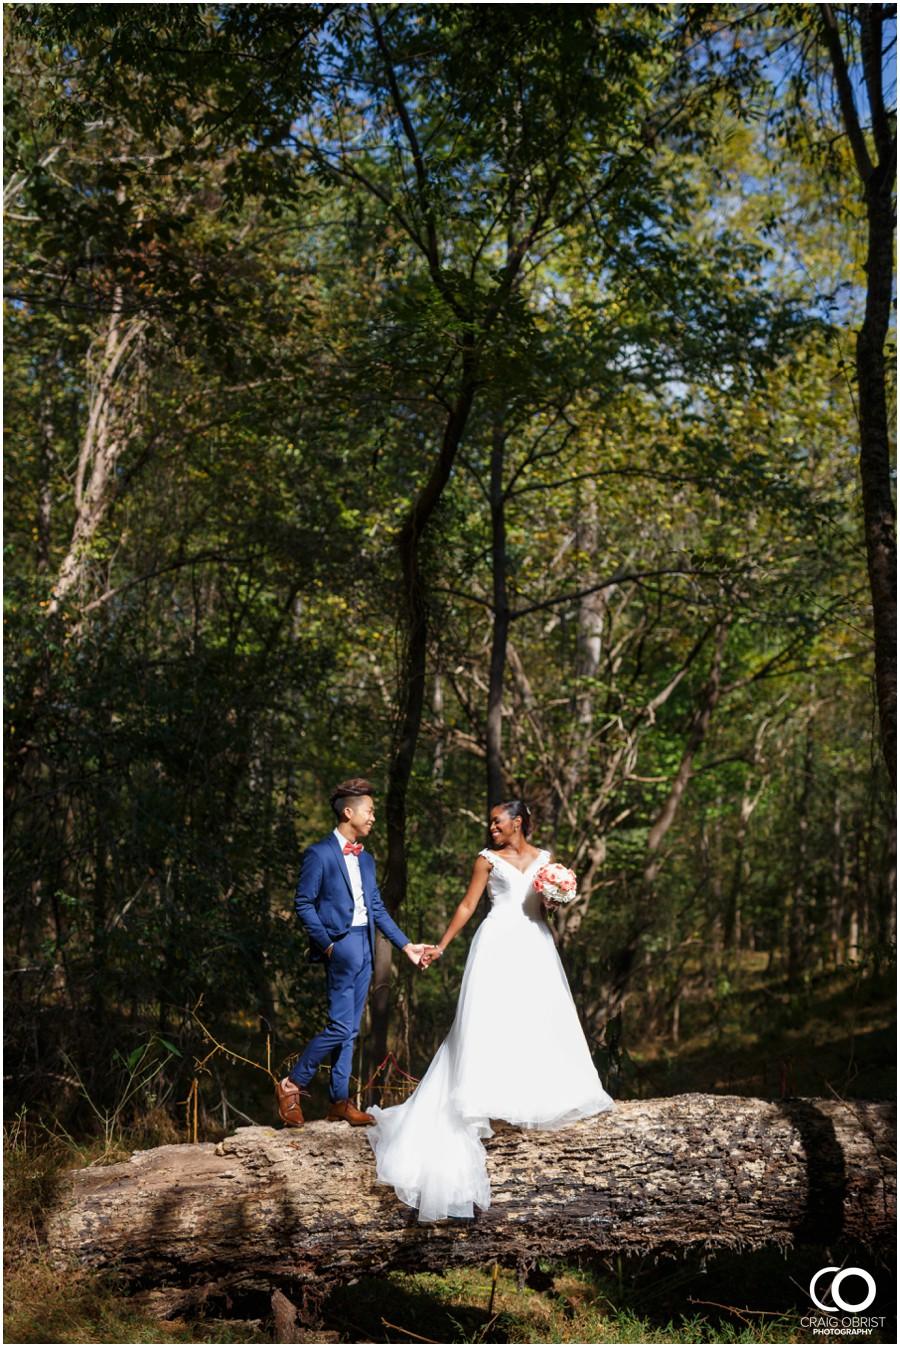 Atrium Norcross McDaniel Farm Park Wedding_0033.jpg